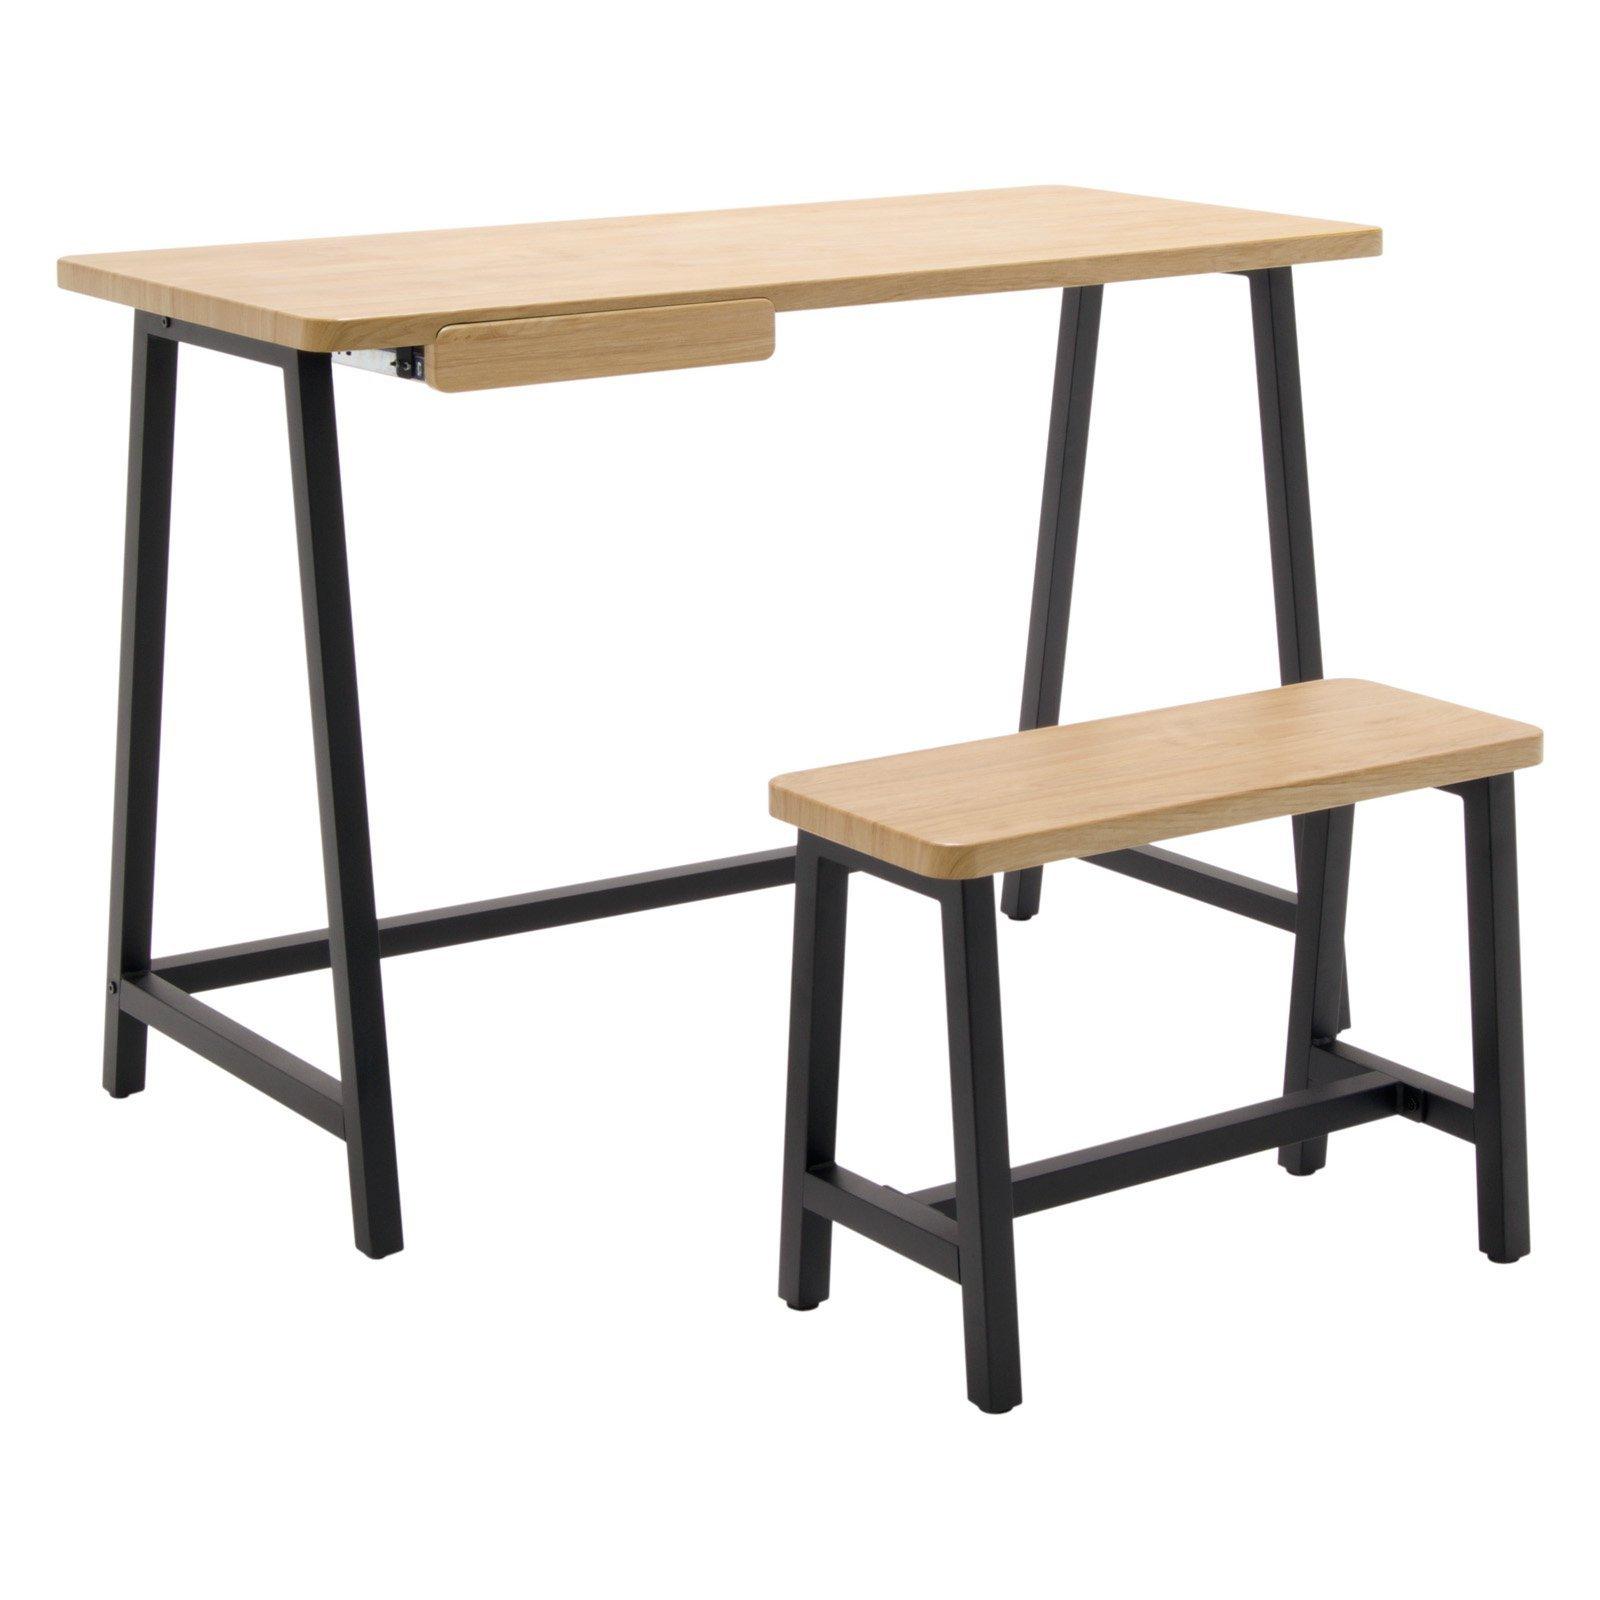 Calico Designs Ashwood Homeroom Desk with Bench - Graphite, Ashwood